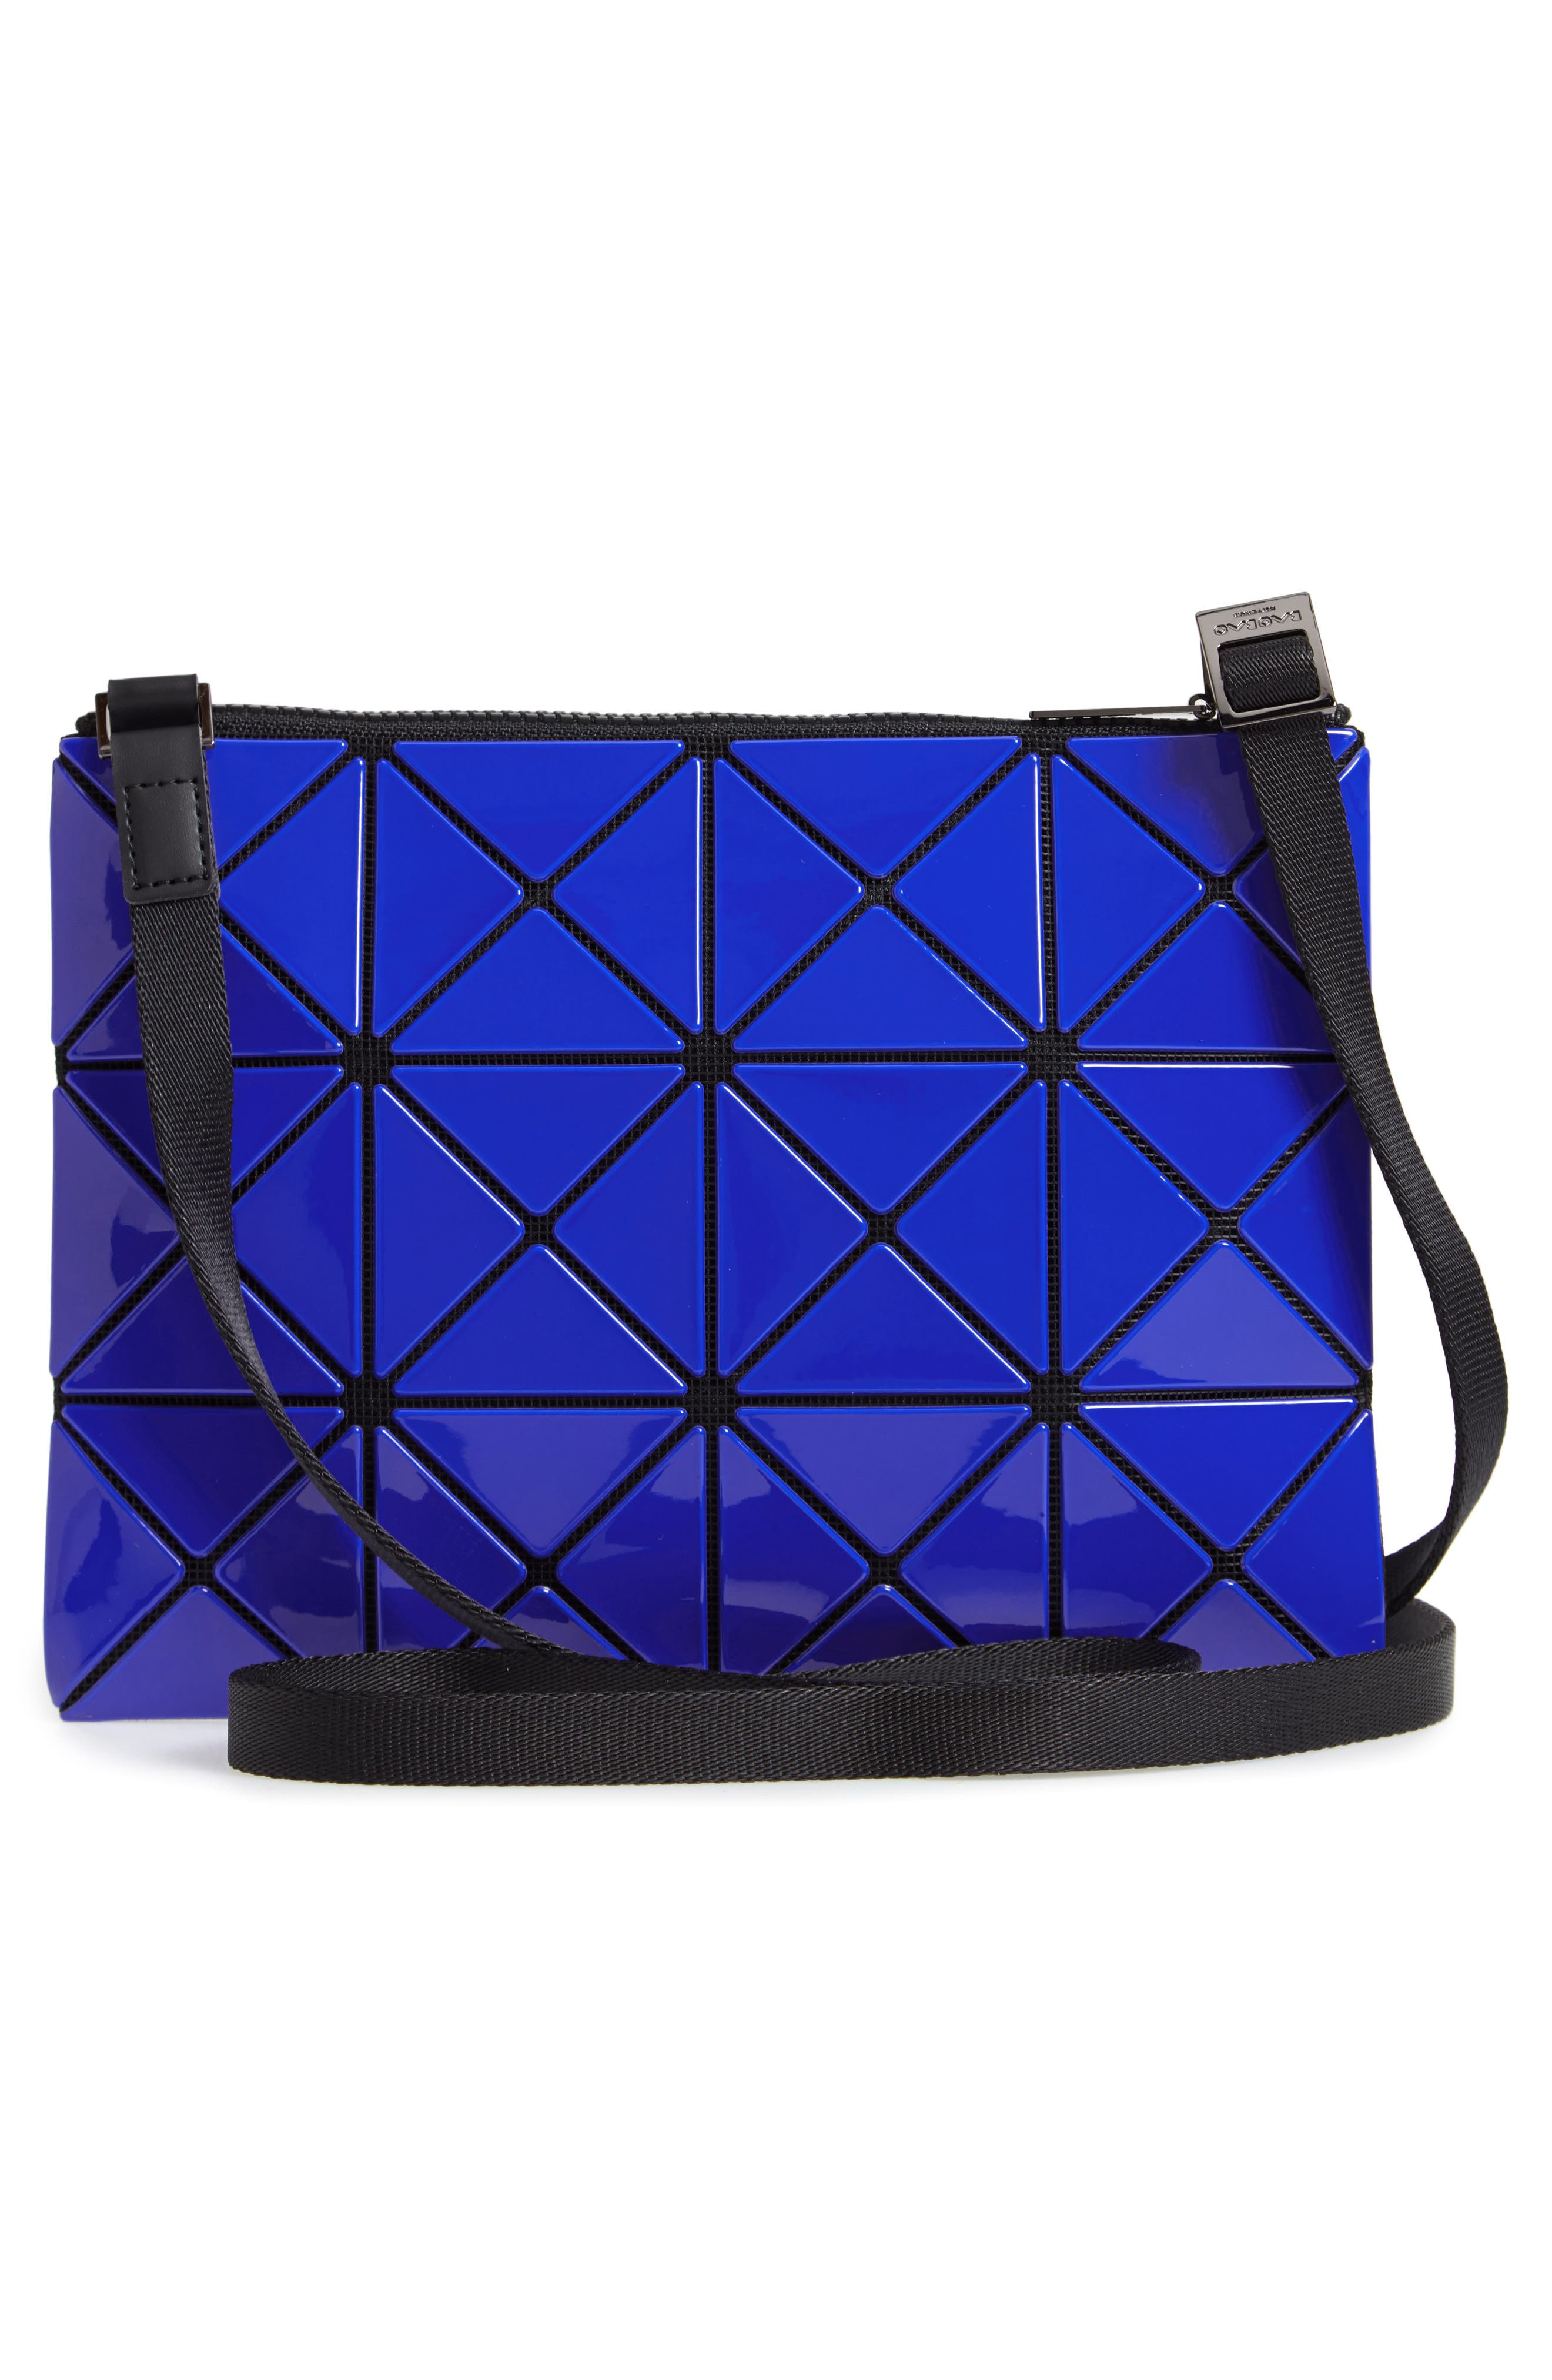 Lucent Two-Tone Crossbody Bag,                             Alternate thumbnail 3, color,                             BLUE/ DARK BLUE